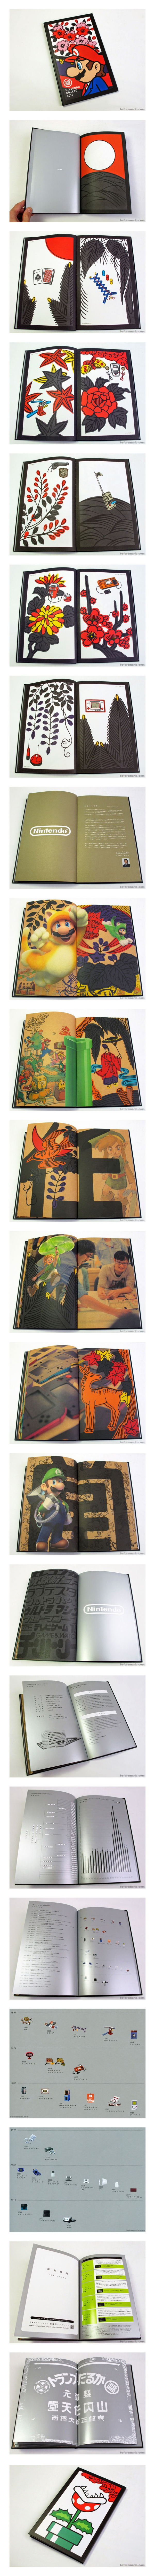 (2014) | Nintendo Recruiting Brochure (2014)